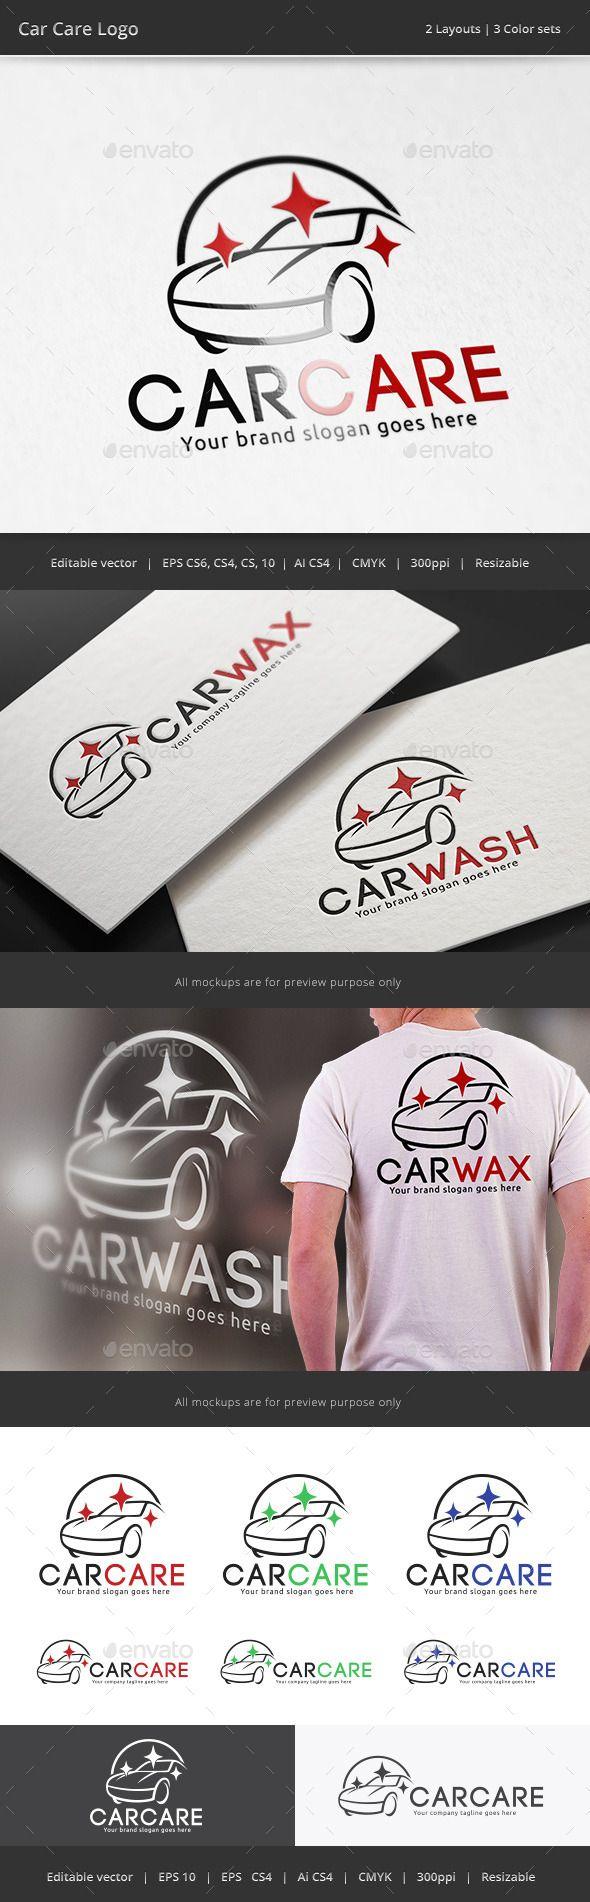 Car Body Sticker Design Eps - Car care logo vector eps auto maintenance available here https